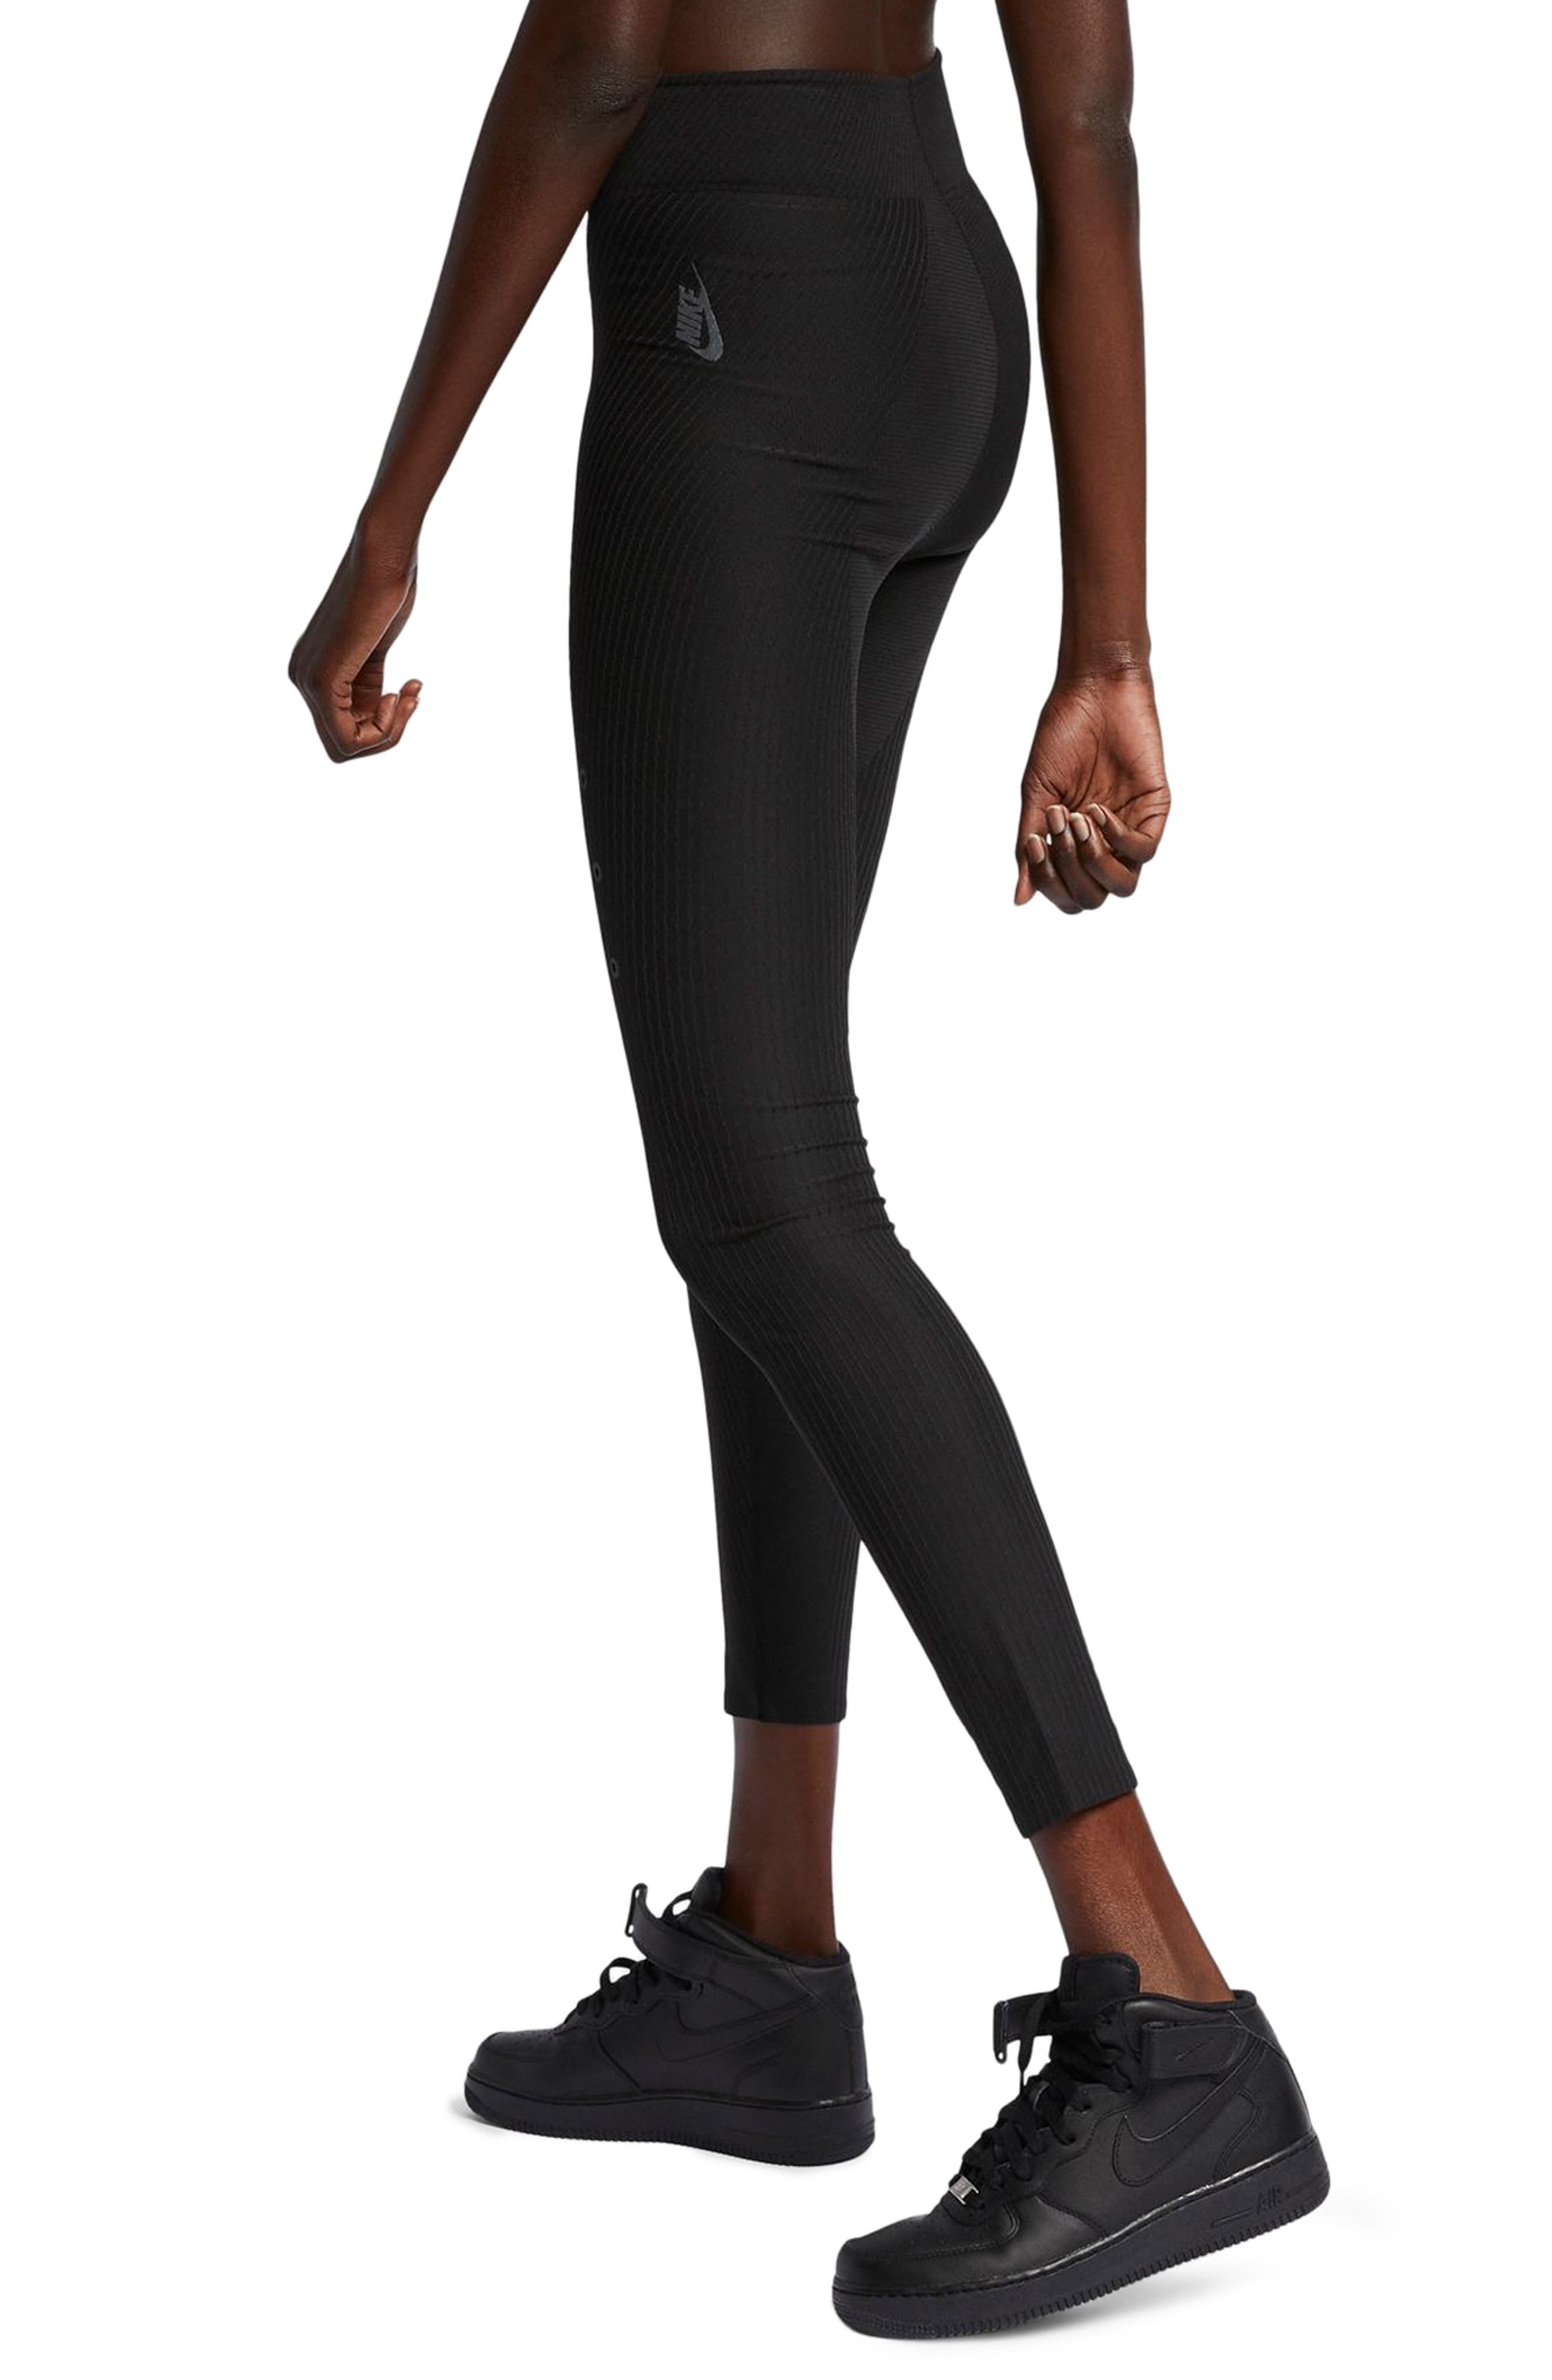 bafc1e178b91 Nike Pants   Capris for Women